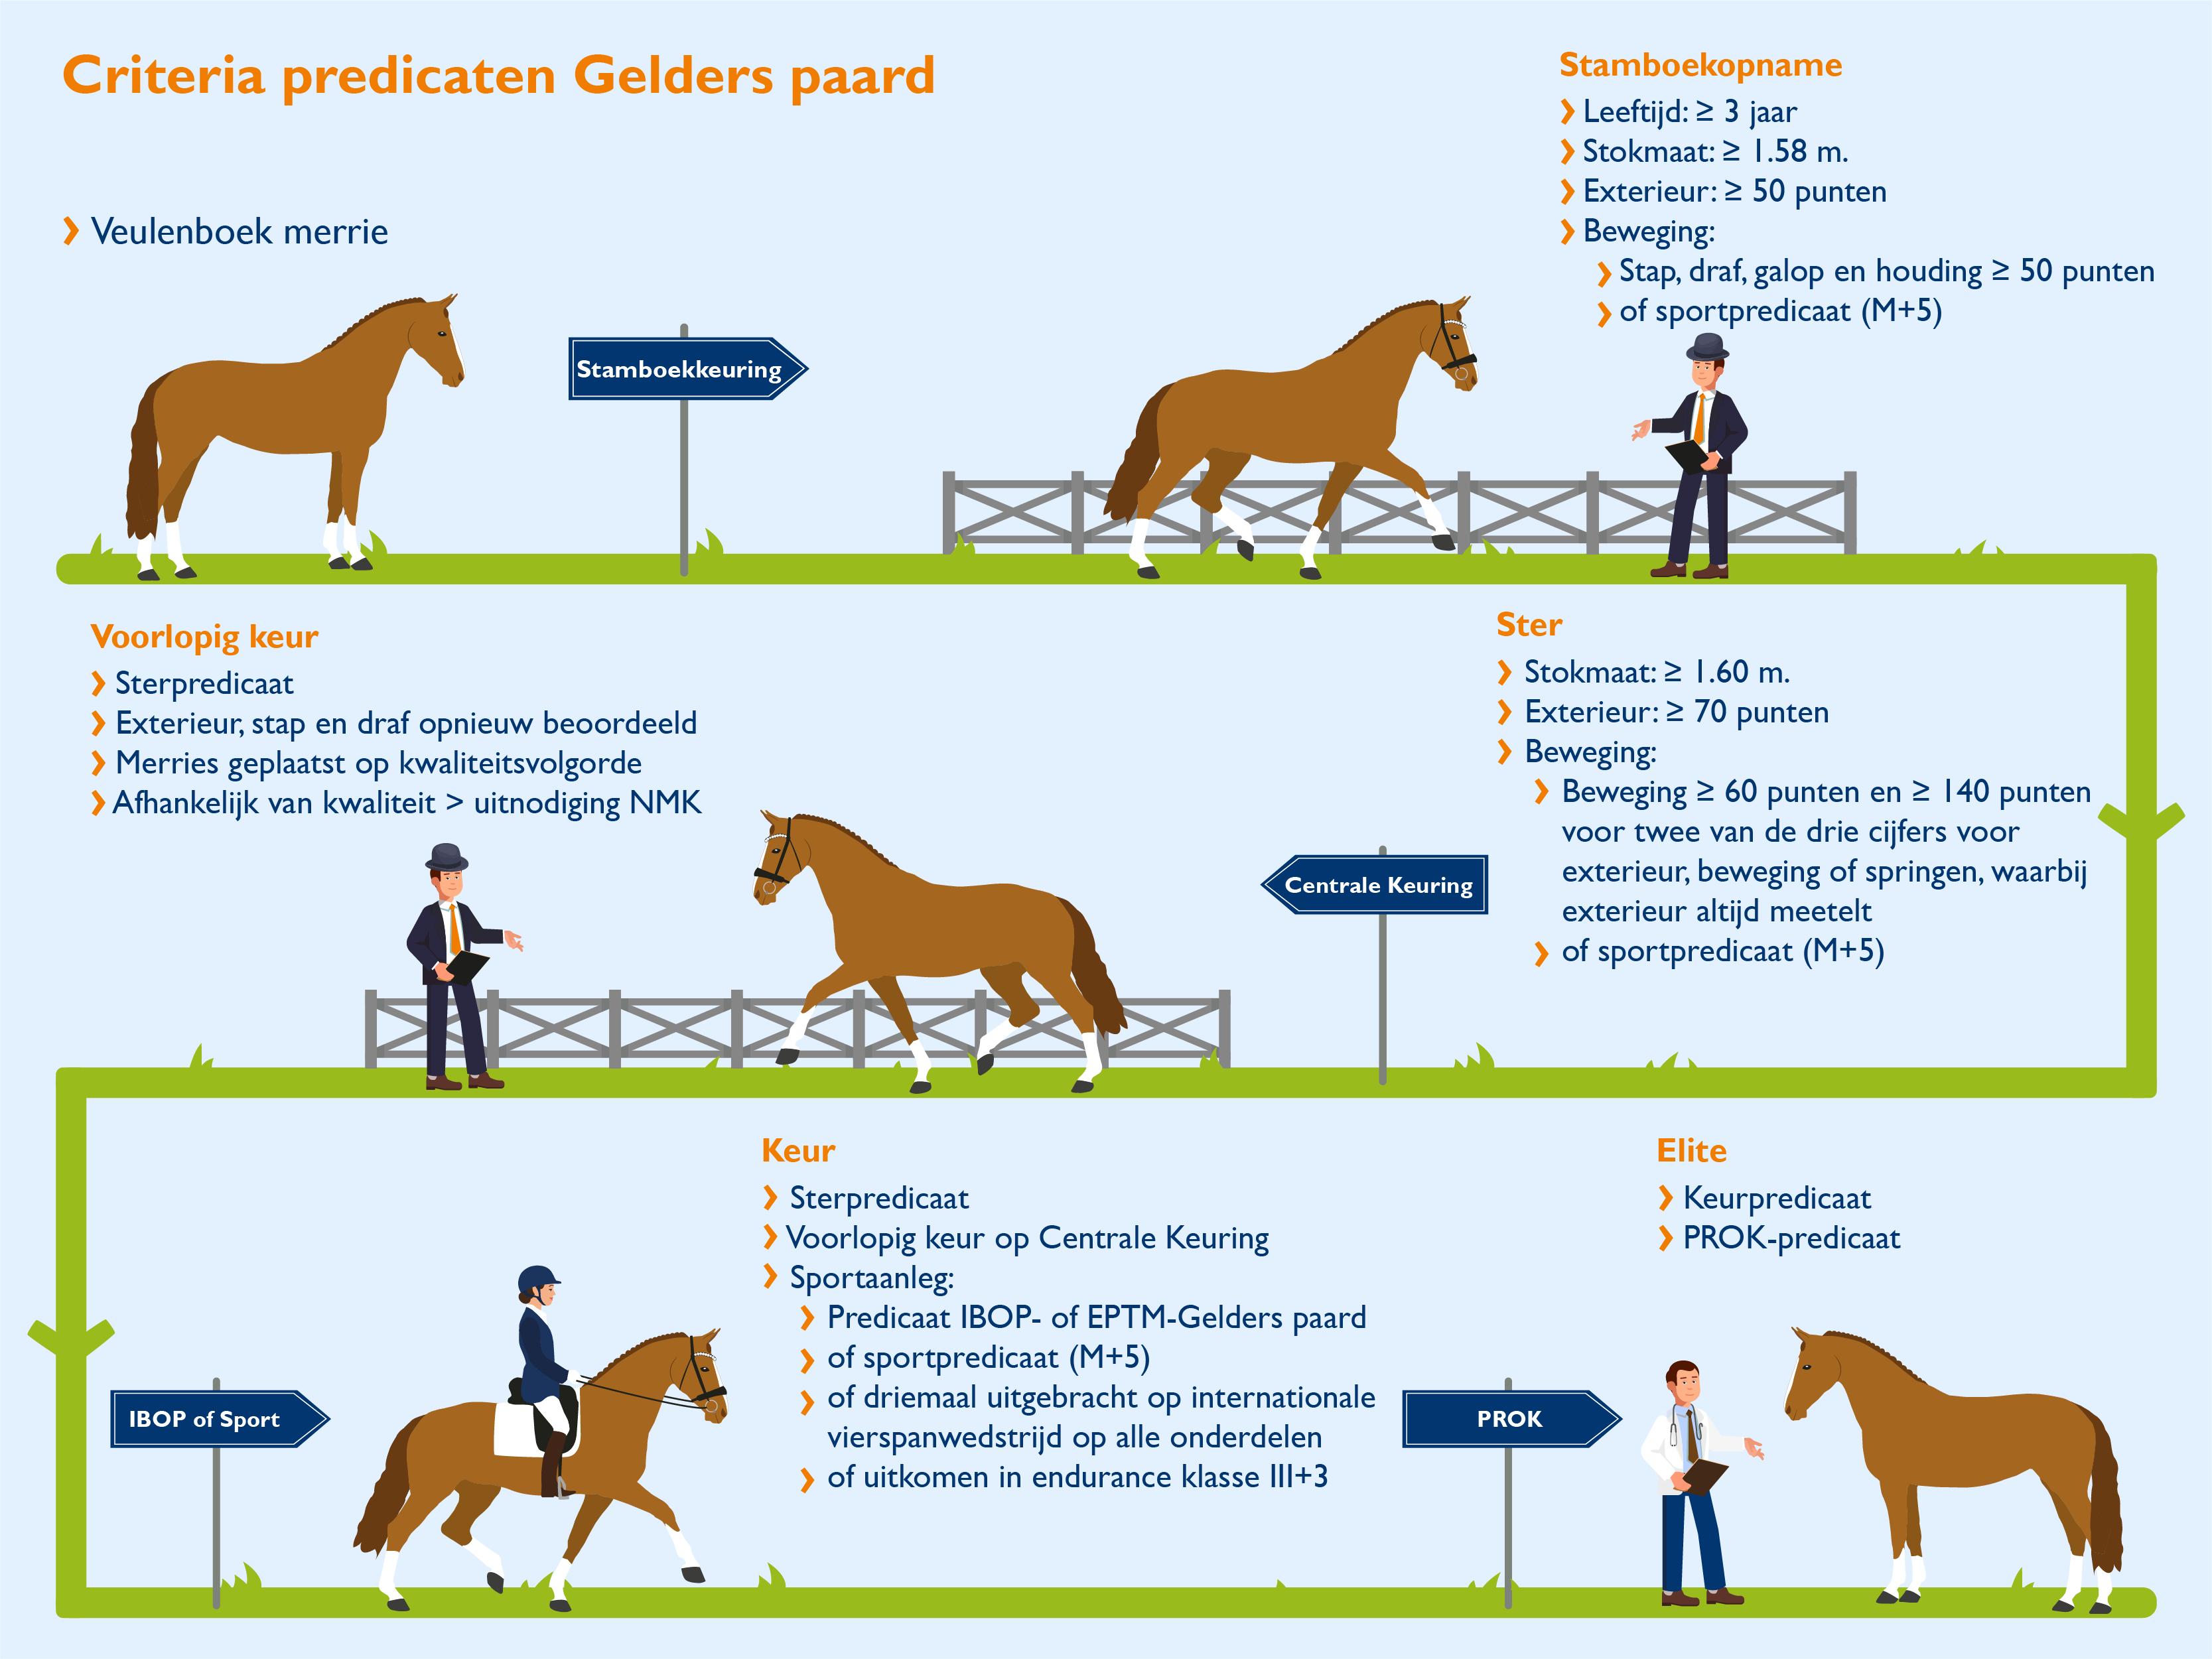 Predicaten Gelders paard_def.png